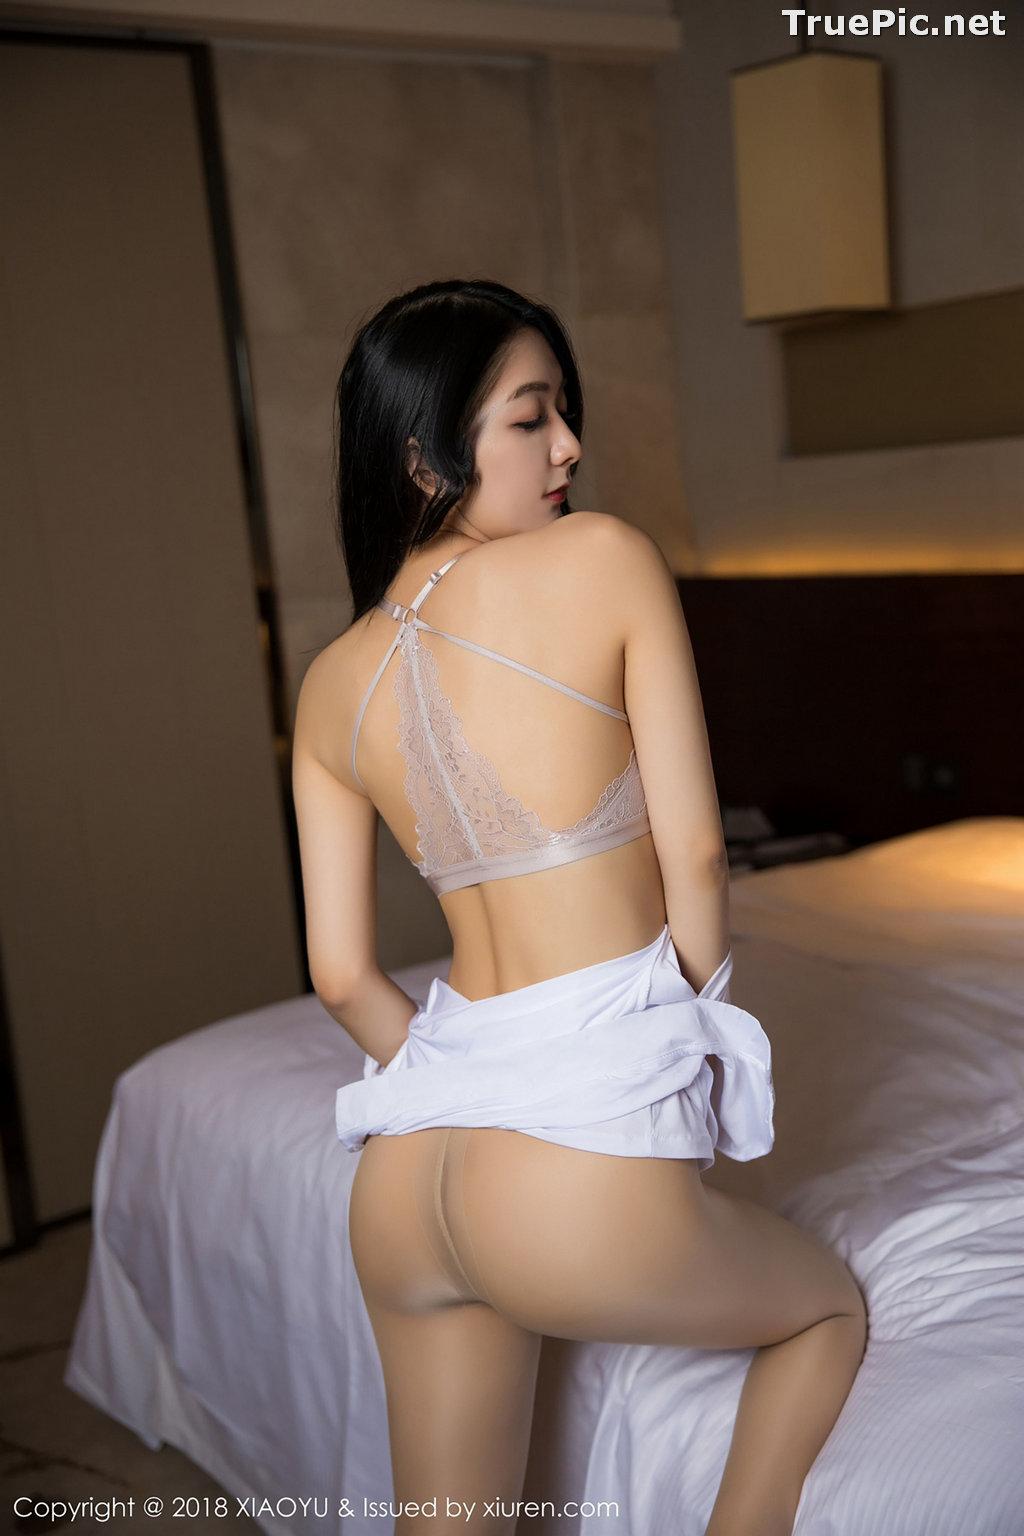 Image XiaoYu No.004 - Chinese Model - Xiao Reba (Angela喜欢猫) - White Sexy Nurse - TruePic.net - Picture-40